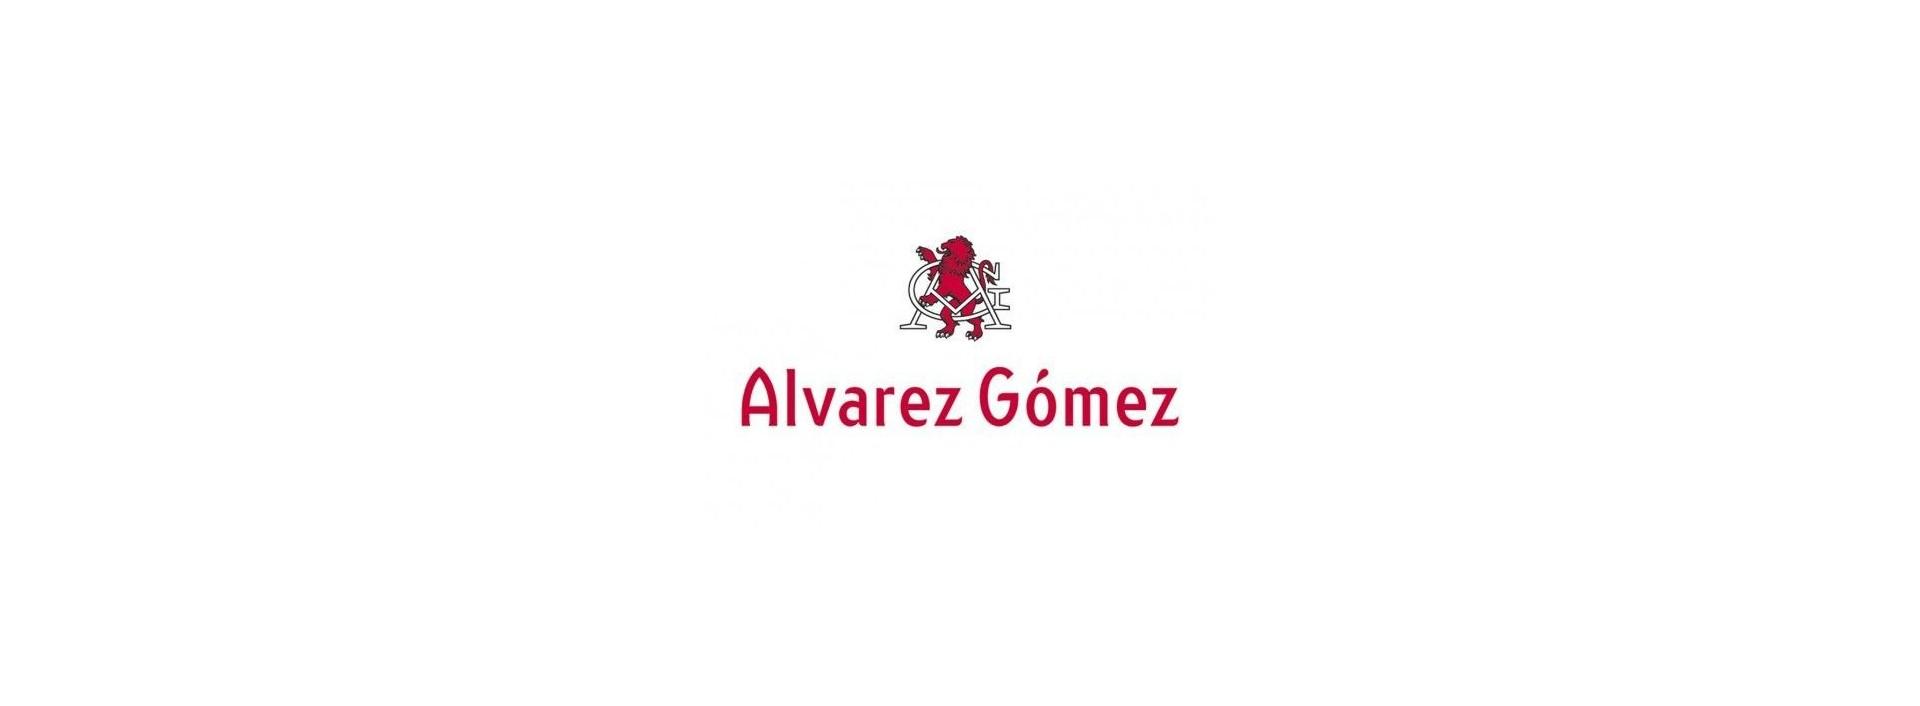 Alvarez Gómez Perfumes ya a la venta en galisl.com tu web del ahorro!!!